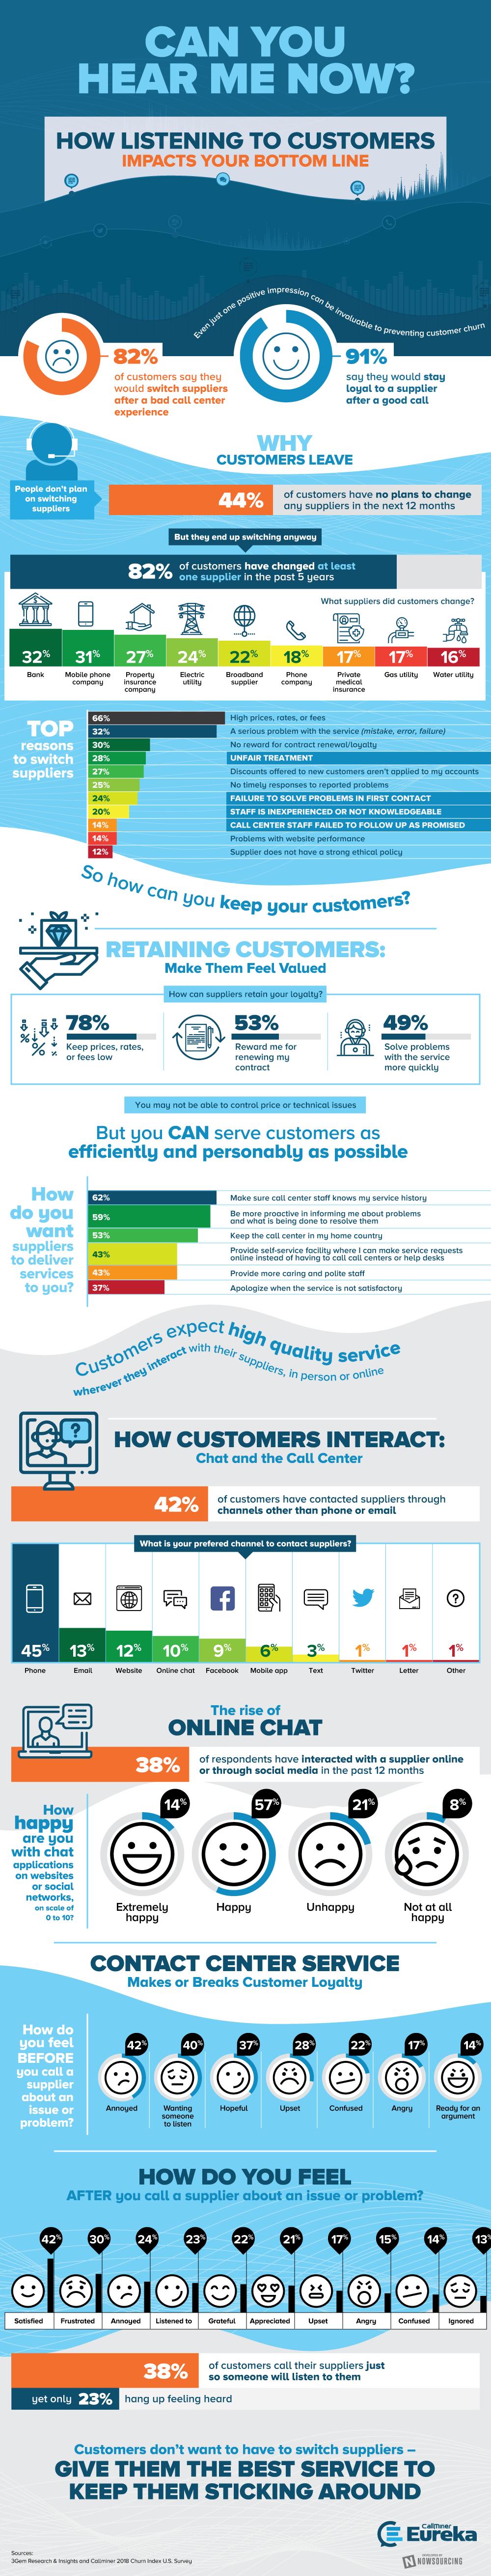 importance-of-customer-listening